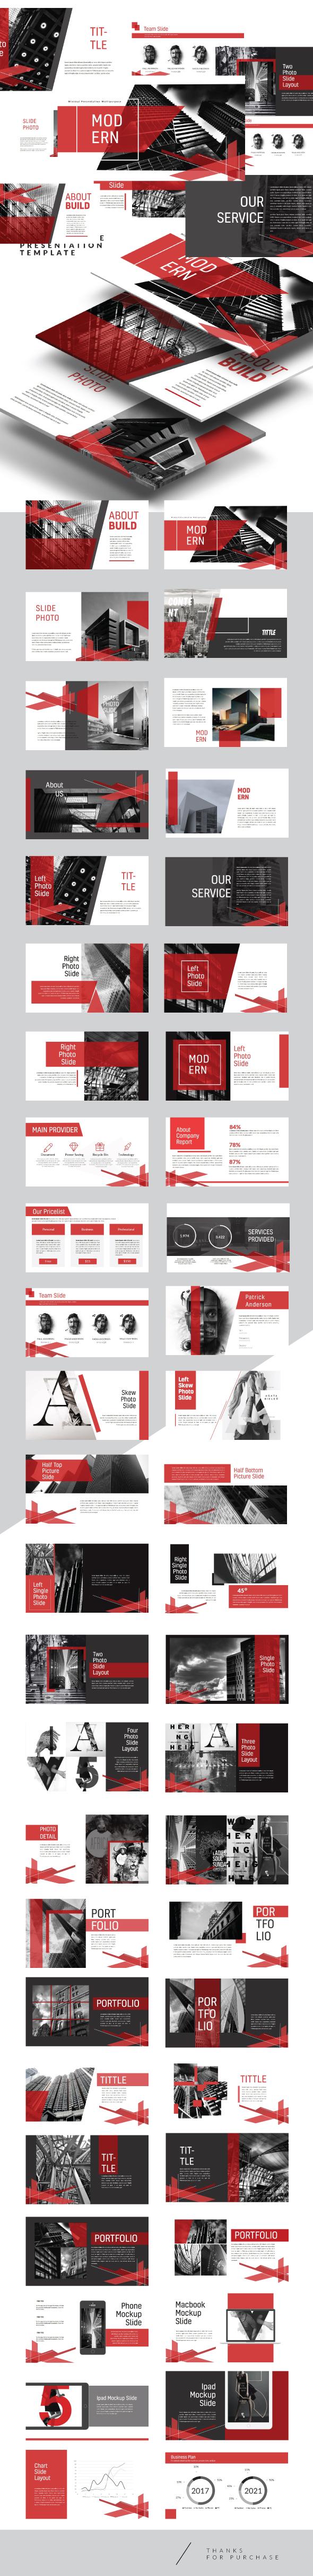 Arch - Creative Multipurpose Keynote Template - Creative Keynote Templates